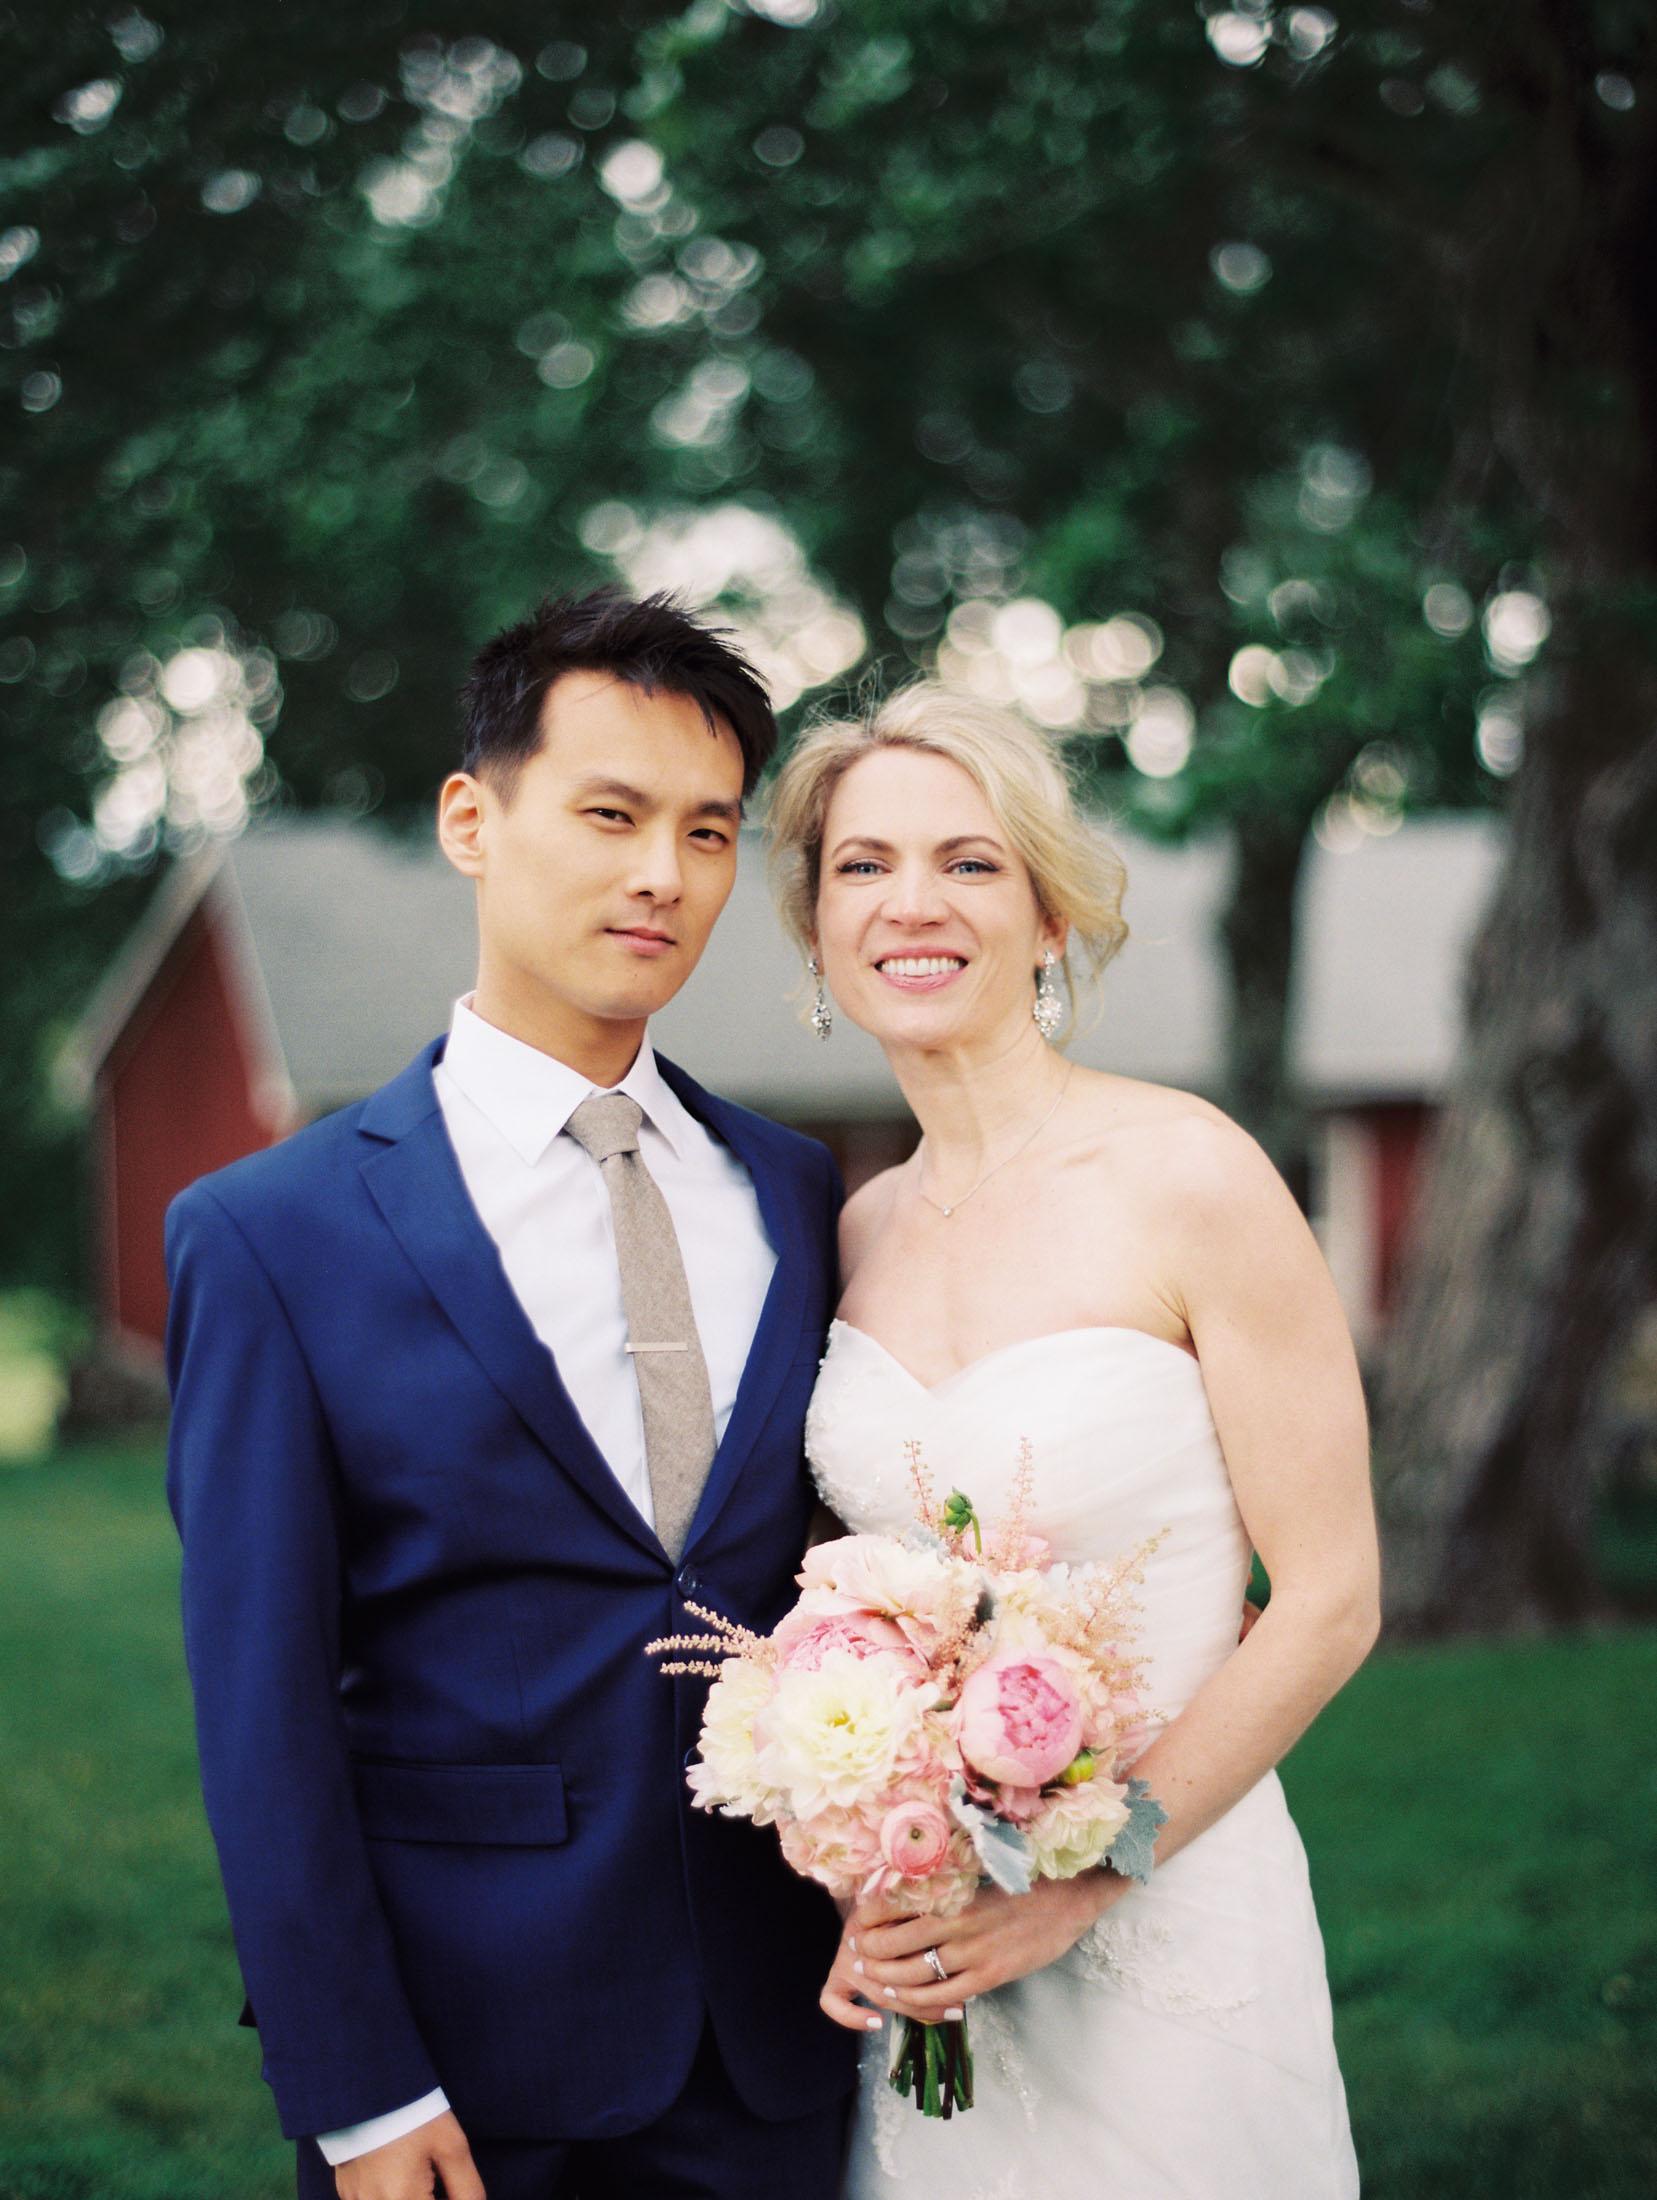 Blissful-Meadows-wedding-13.jpg